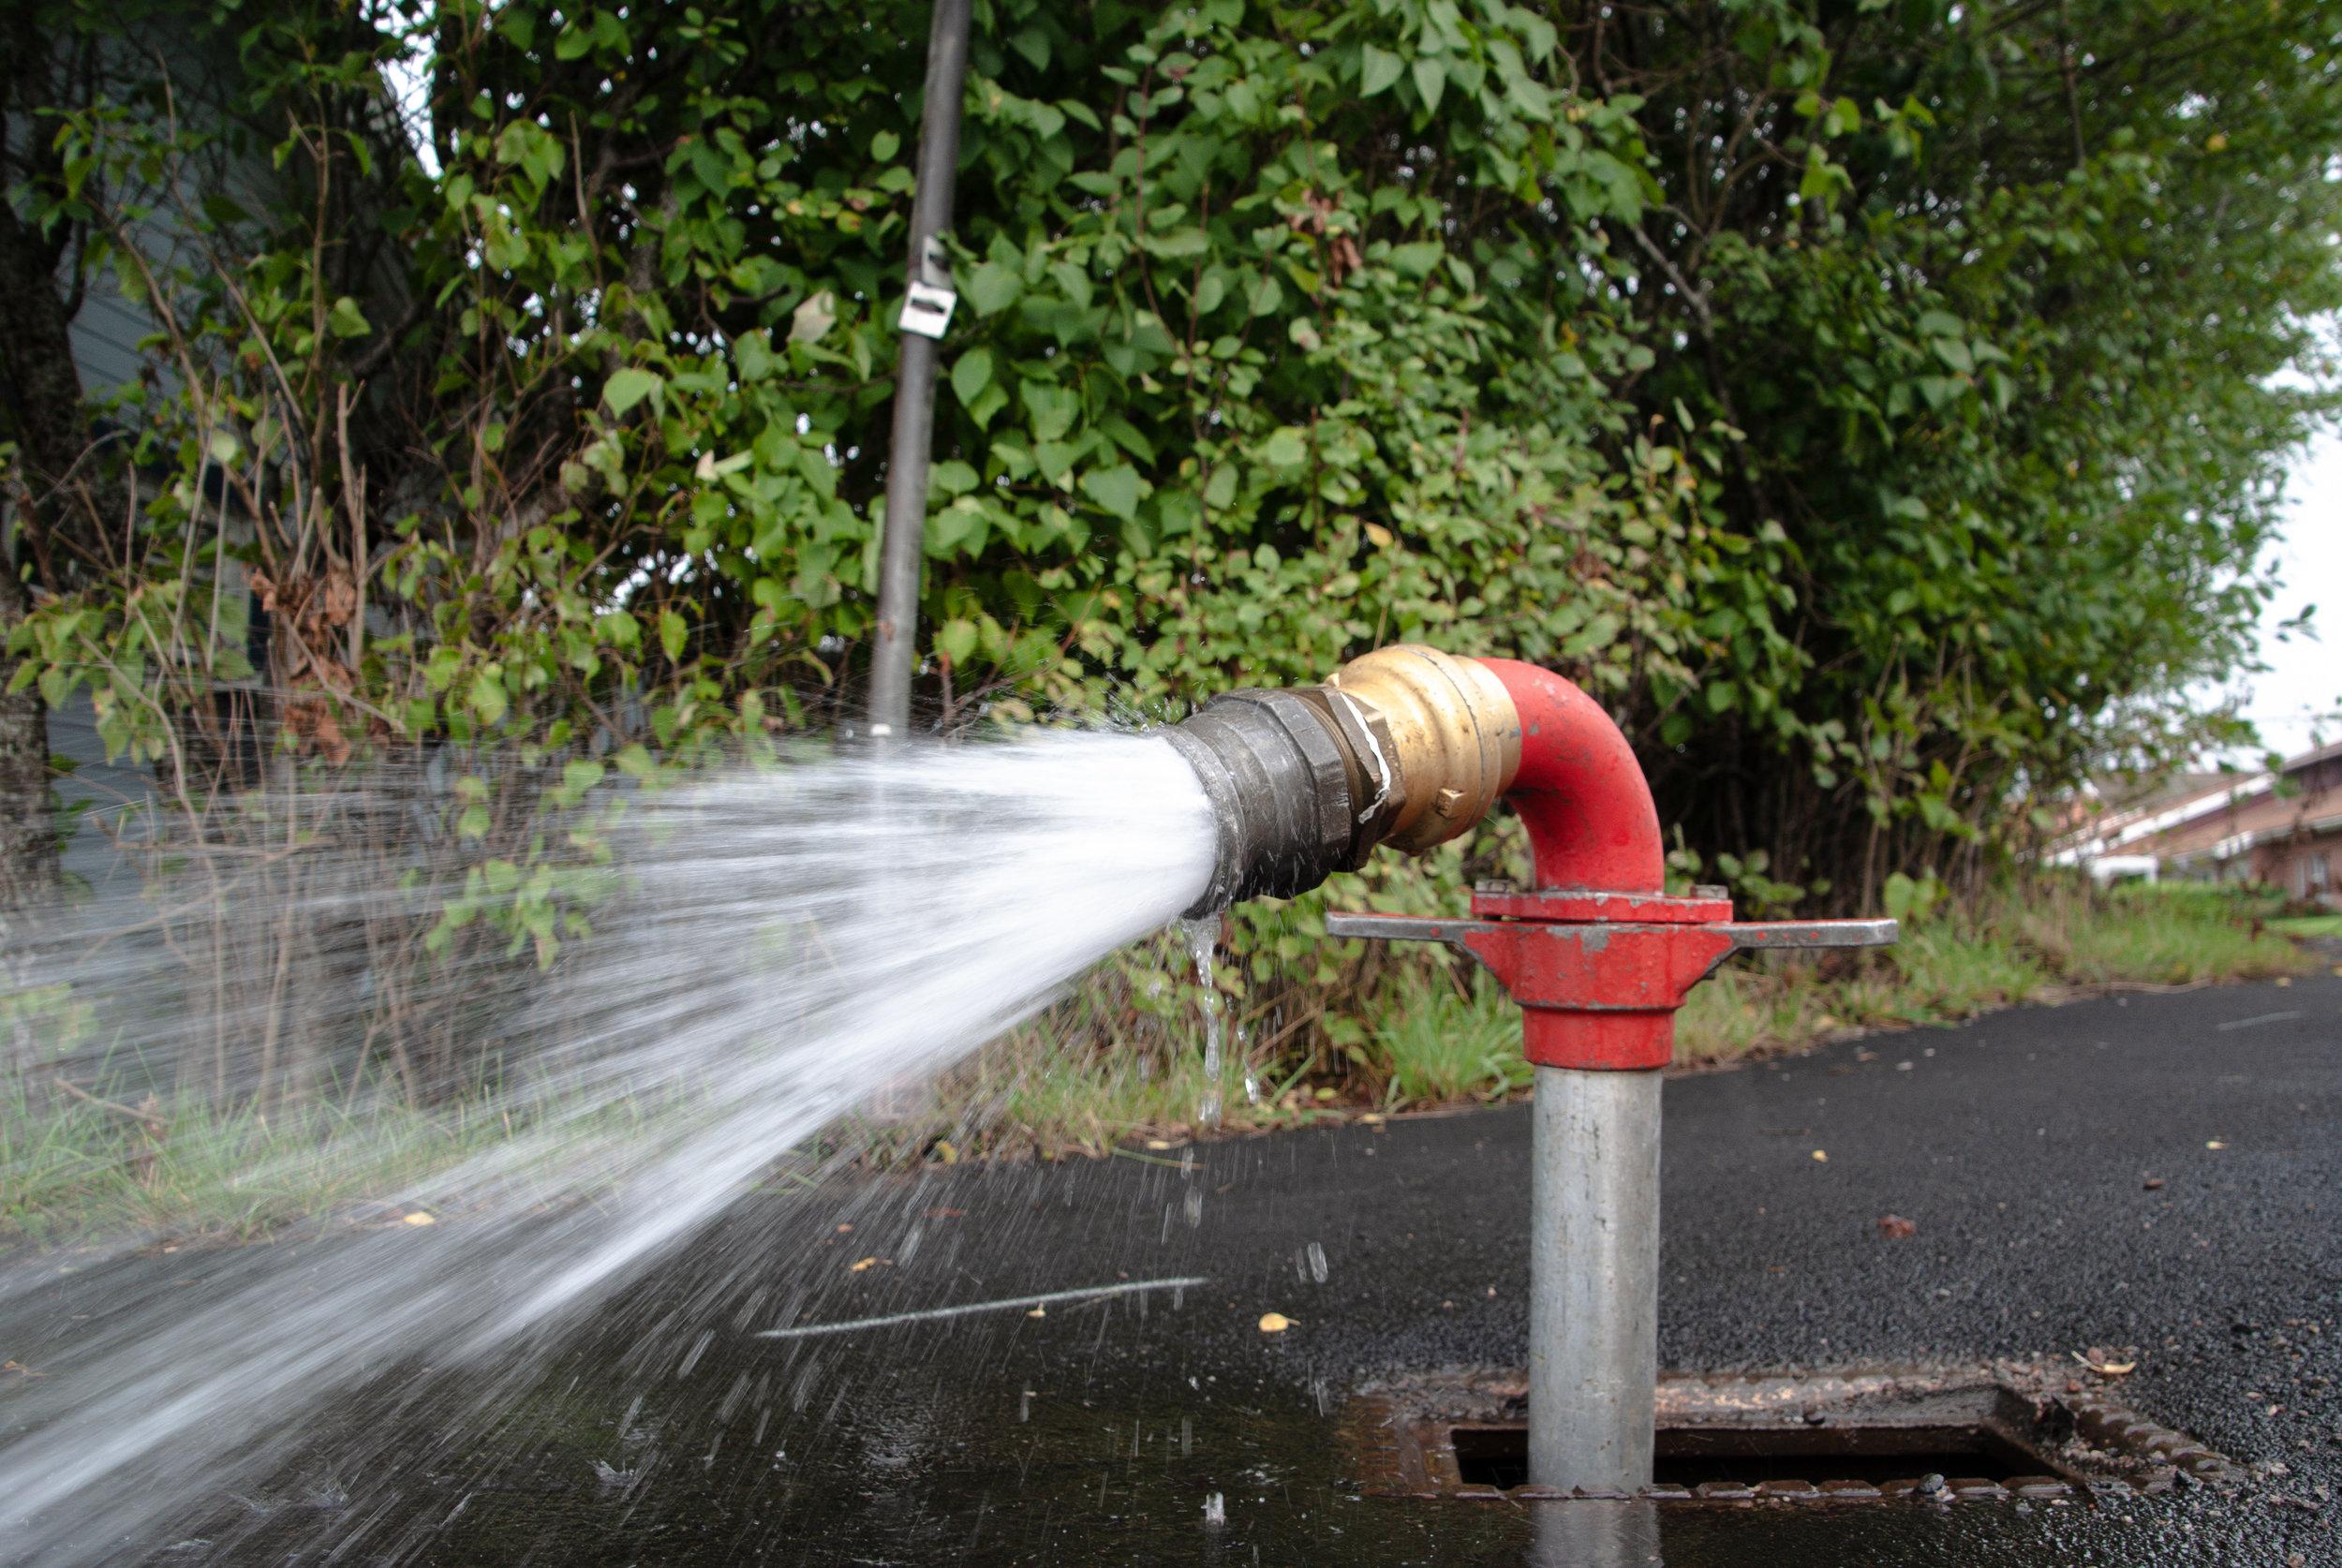 pollex-luftvattenspolning-brandpost-rent-dricksvatten-vatten.jpg